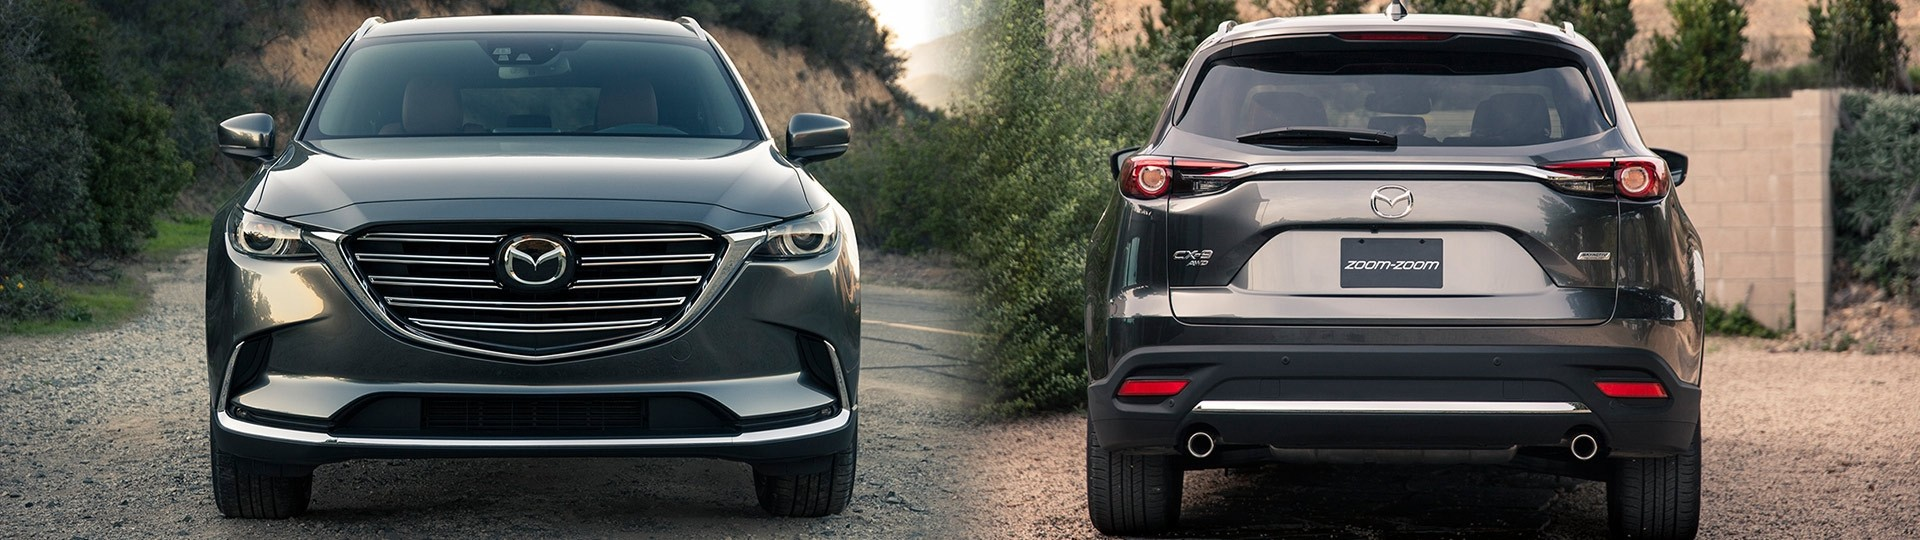 2016-Mazda-CX9-Direct-Front-Back-Exterior-Orlando-FL-mobile